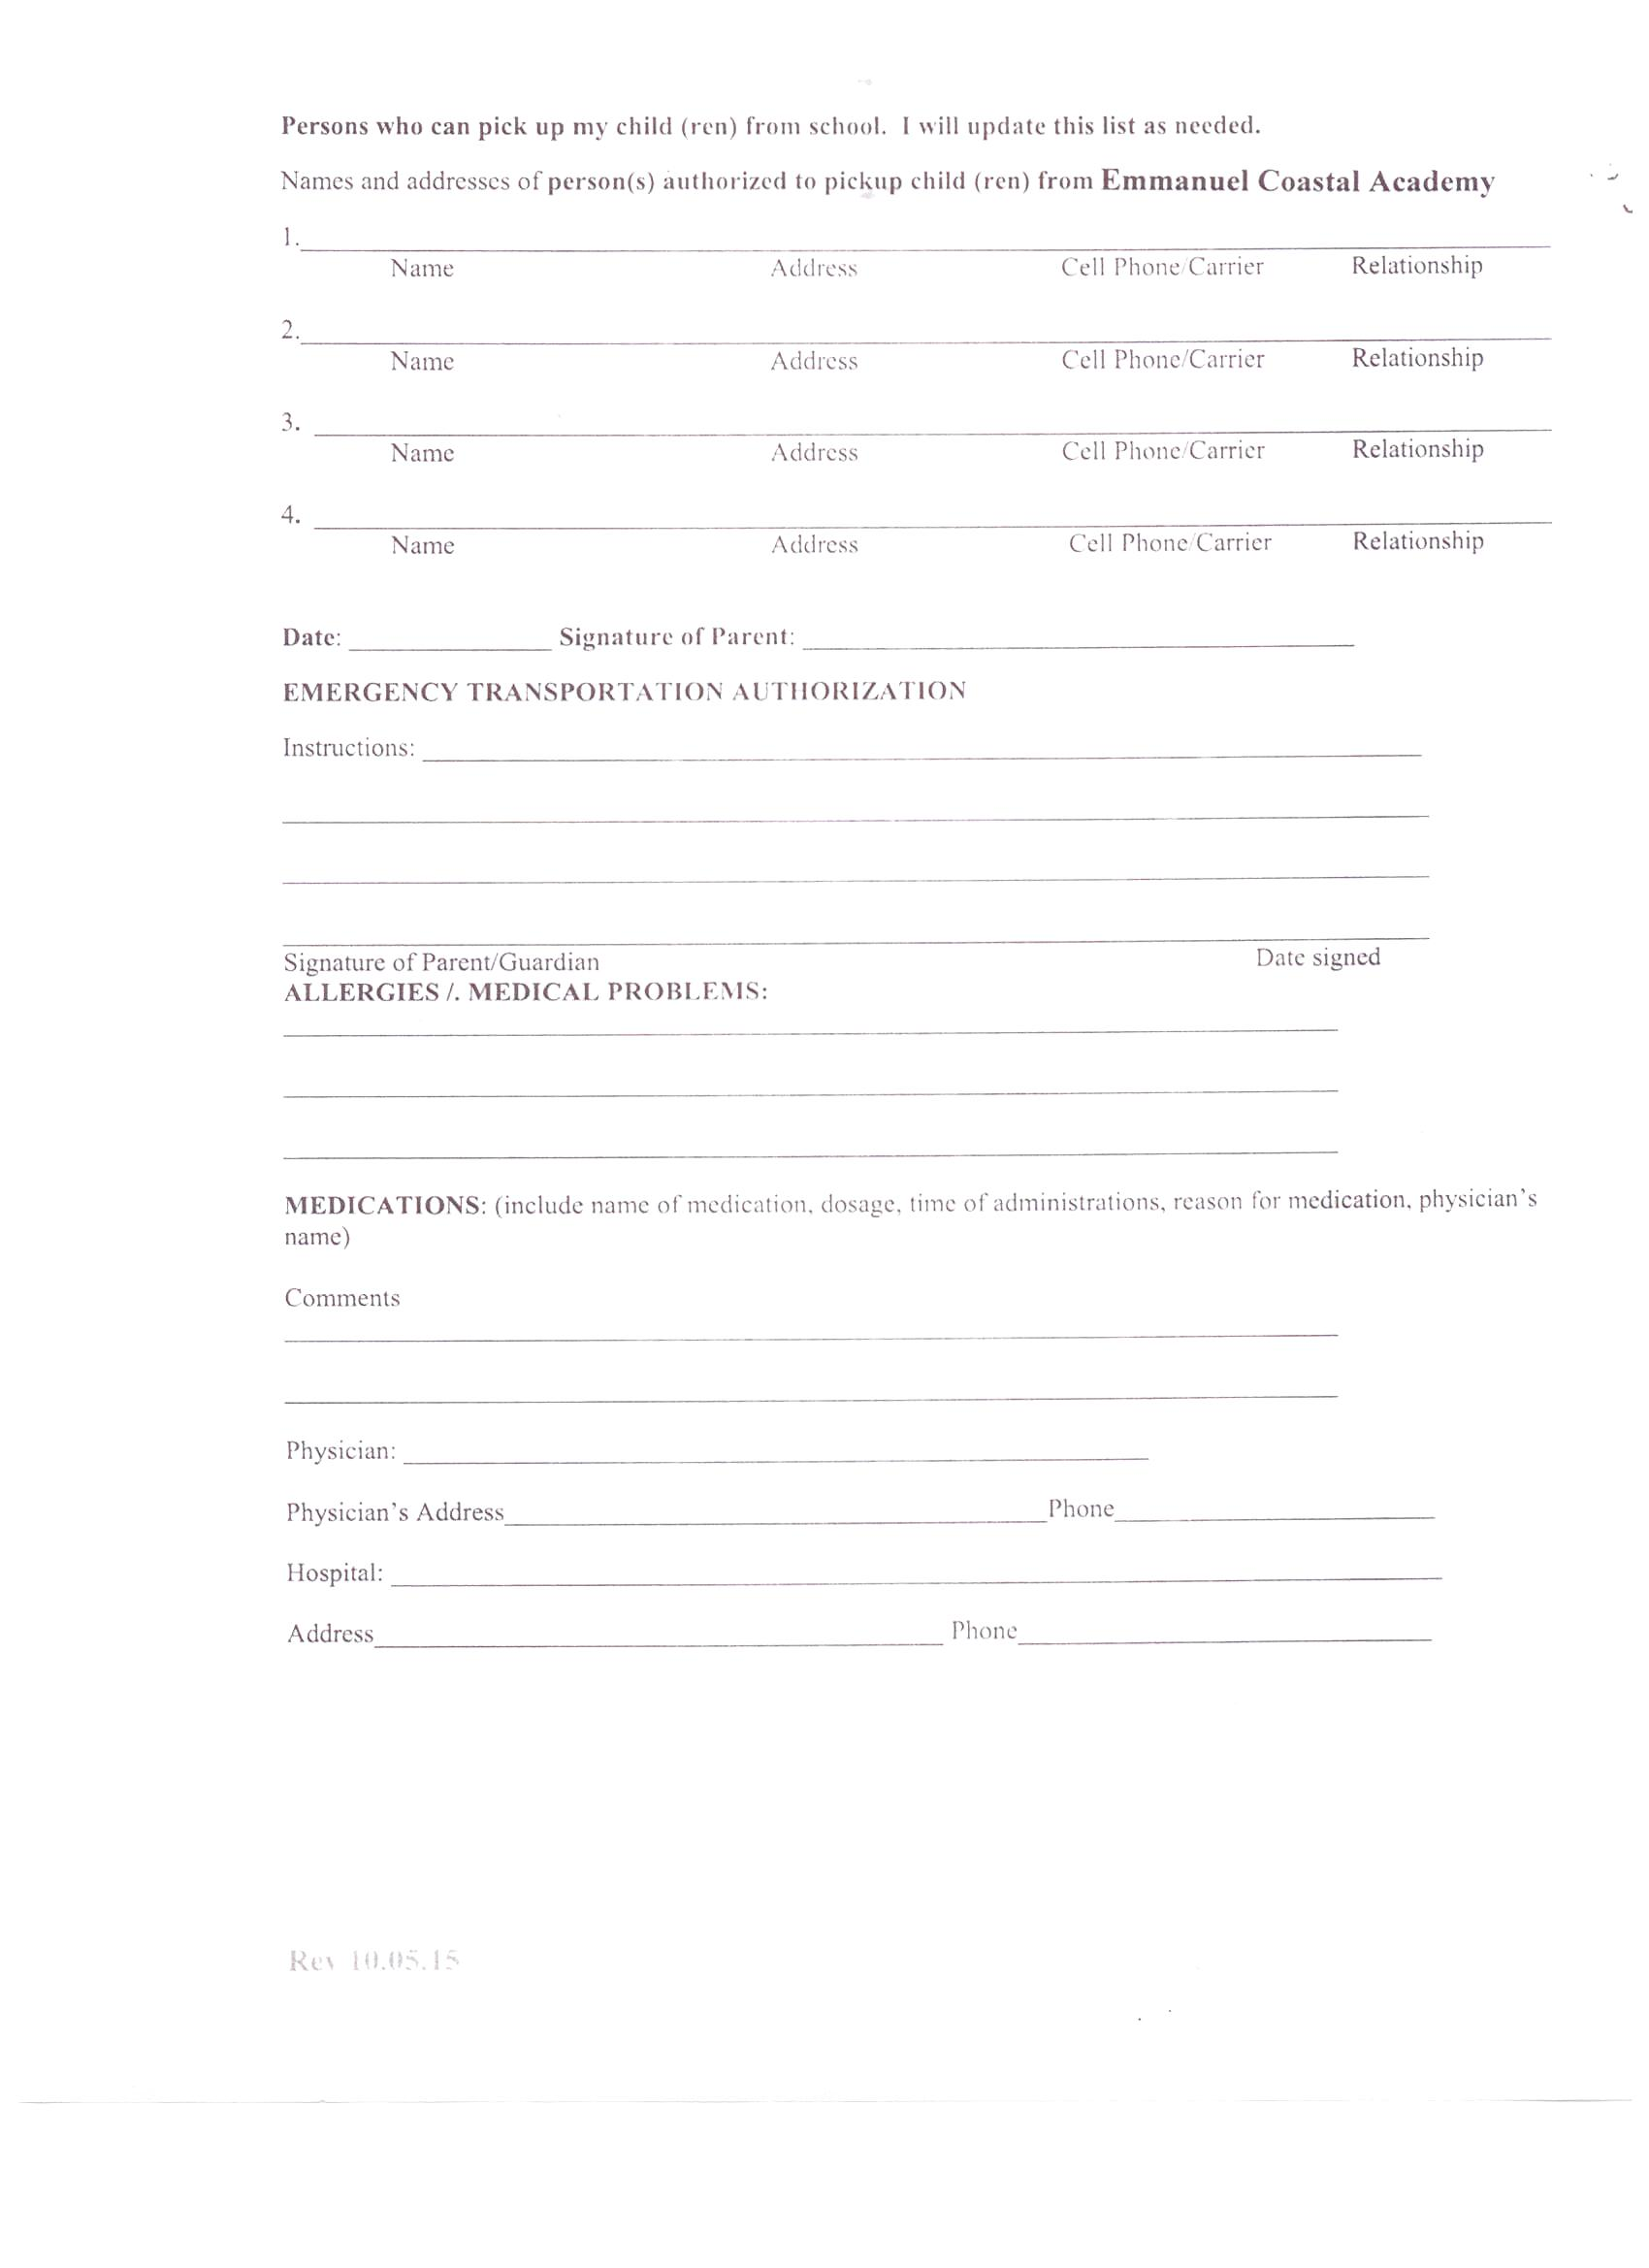 Emmanuel coastal academy jacksonville fl admissions requirements aiddatafo Images